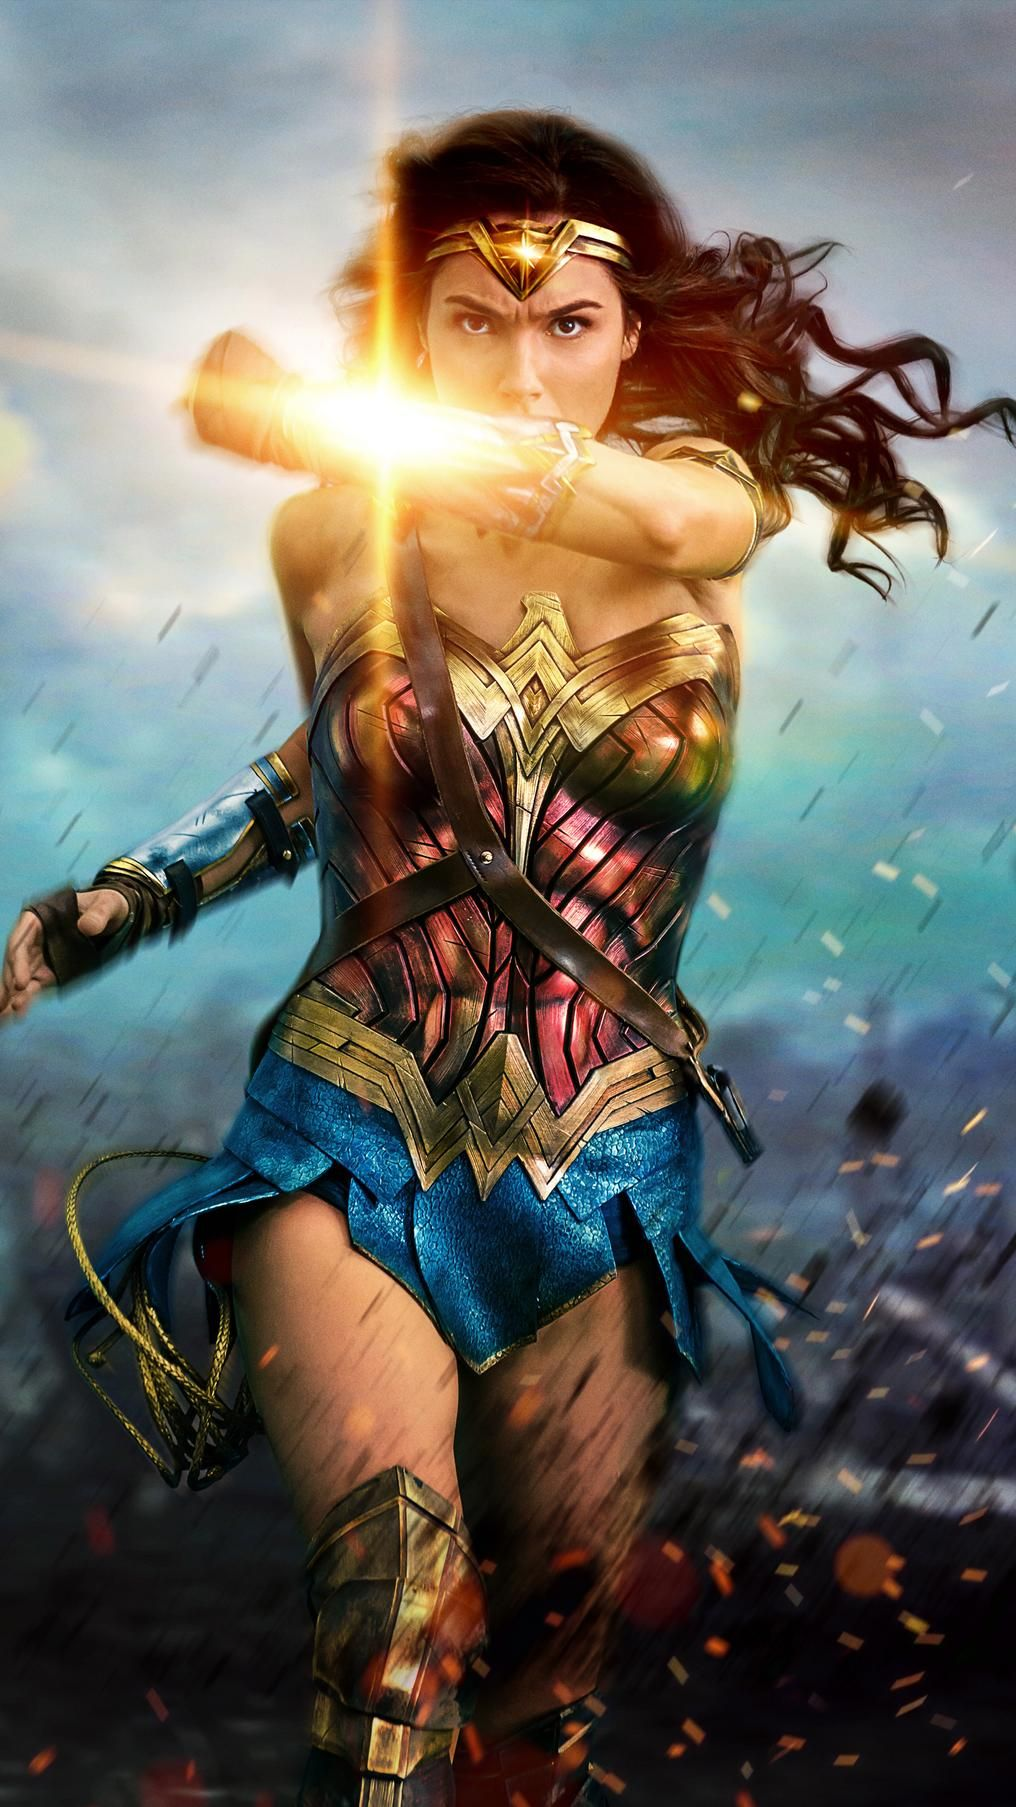 Wonder Woman 2017 Phone Wallpaper Moviemania Wonder woman 1016x1807